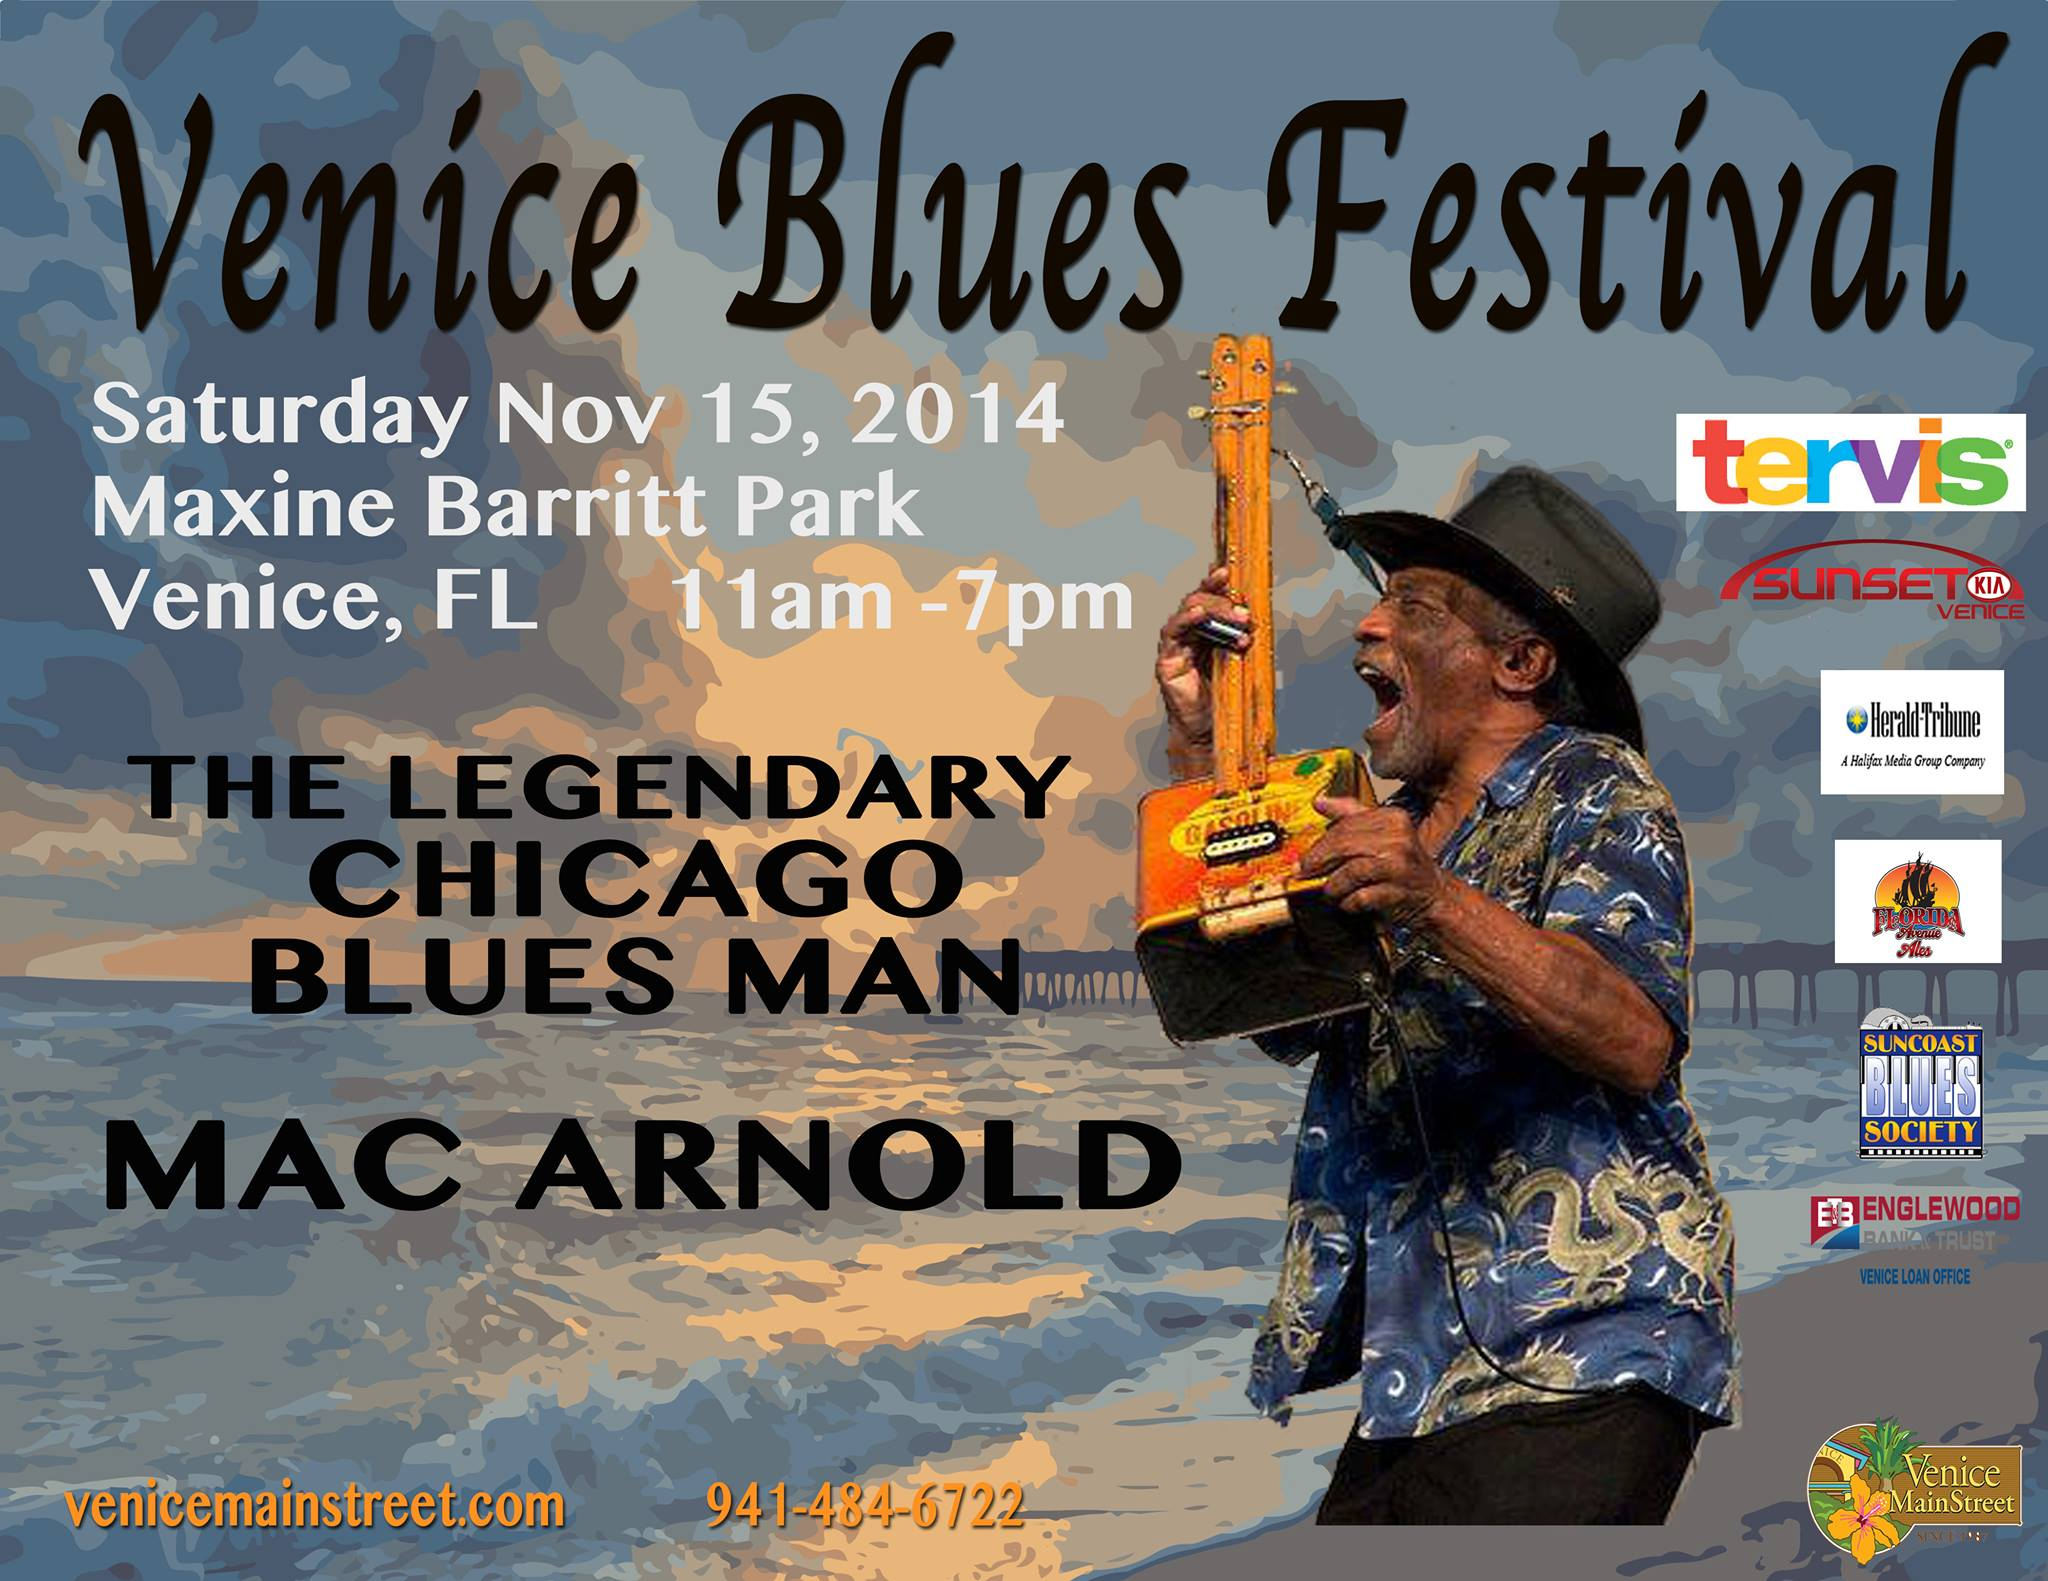 2014 - Venice Blues Festival, FL